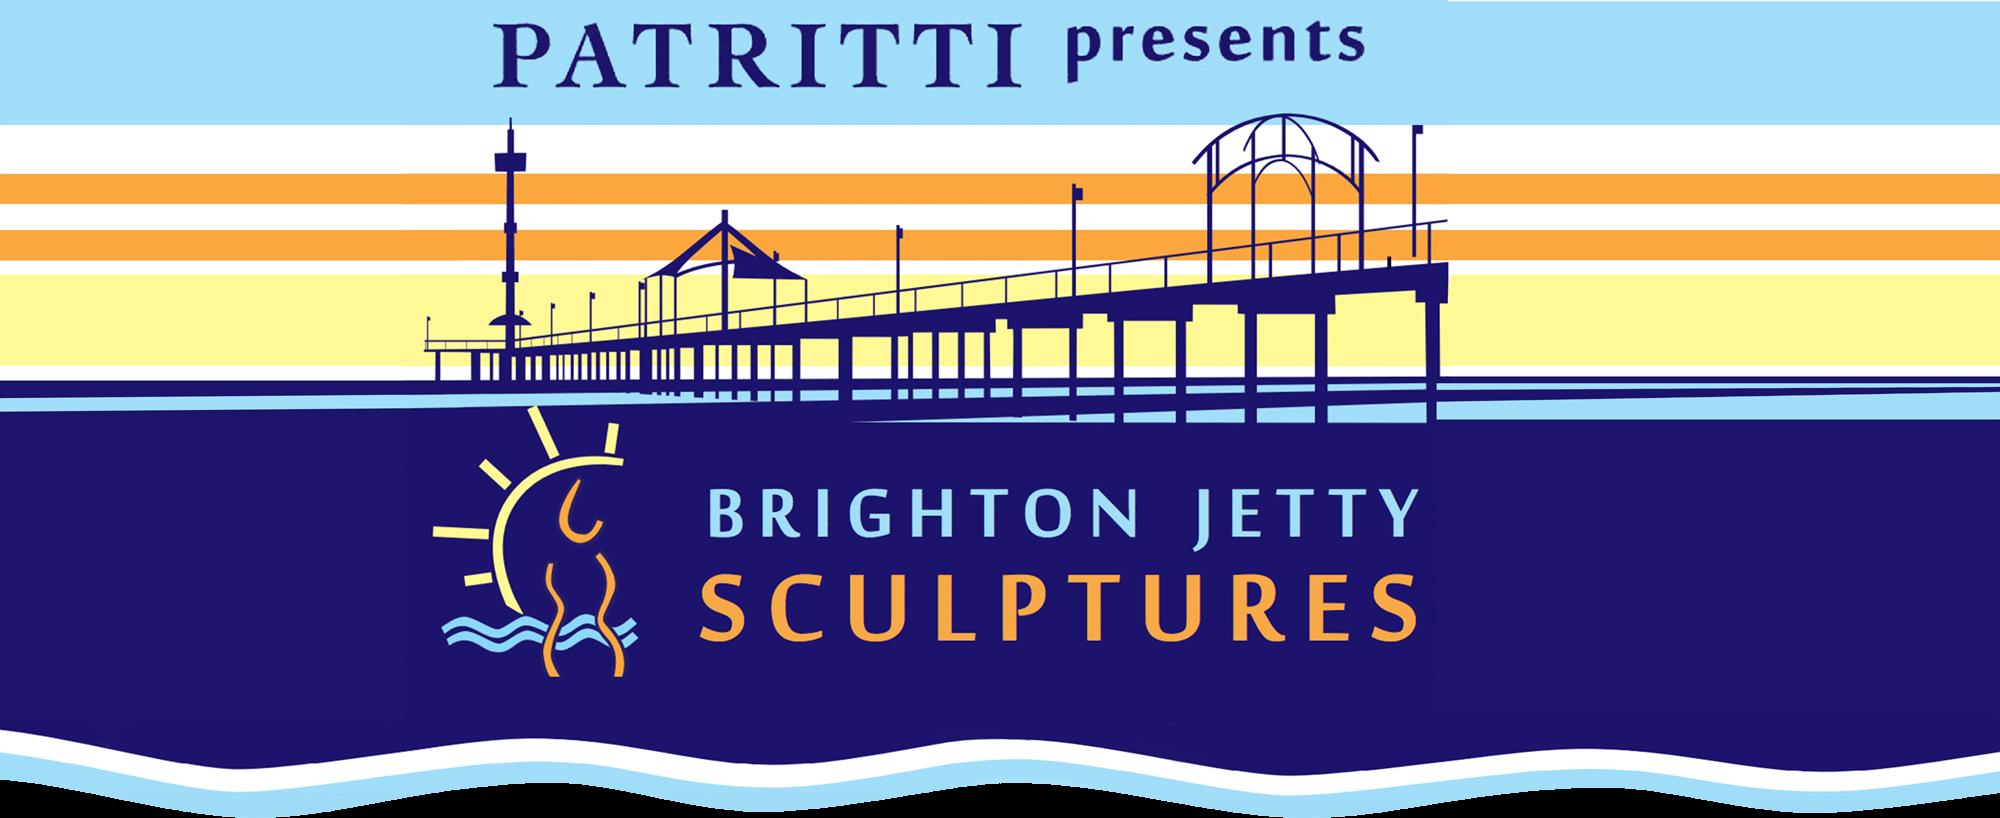 Brighton Jetty Sculptures Sponsorship